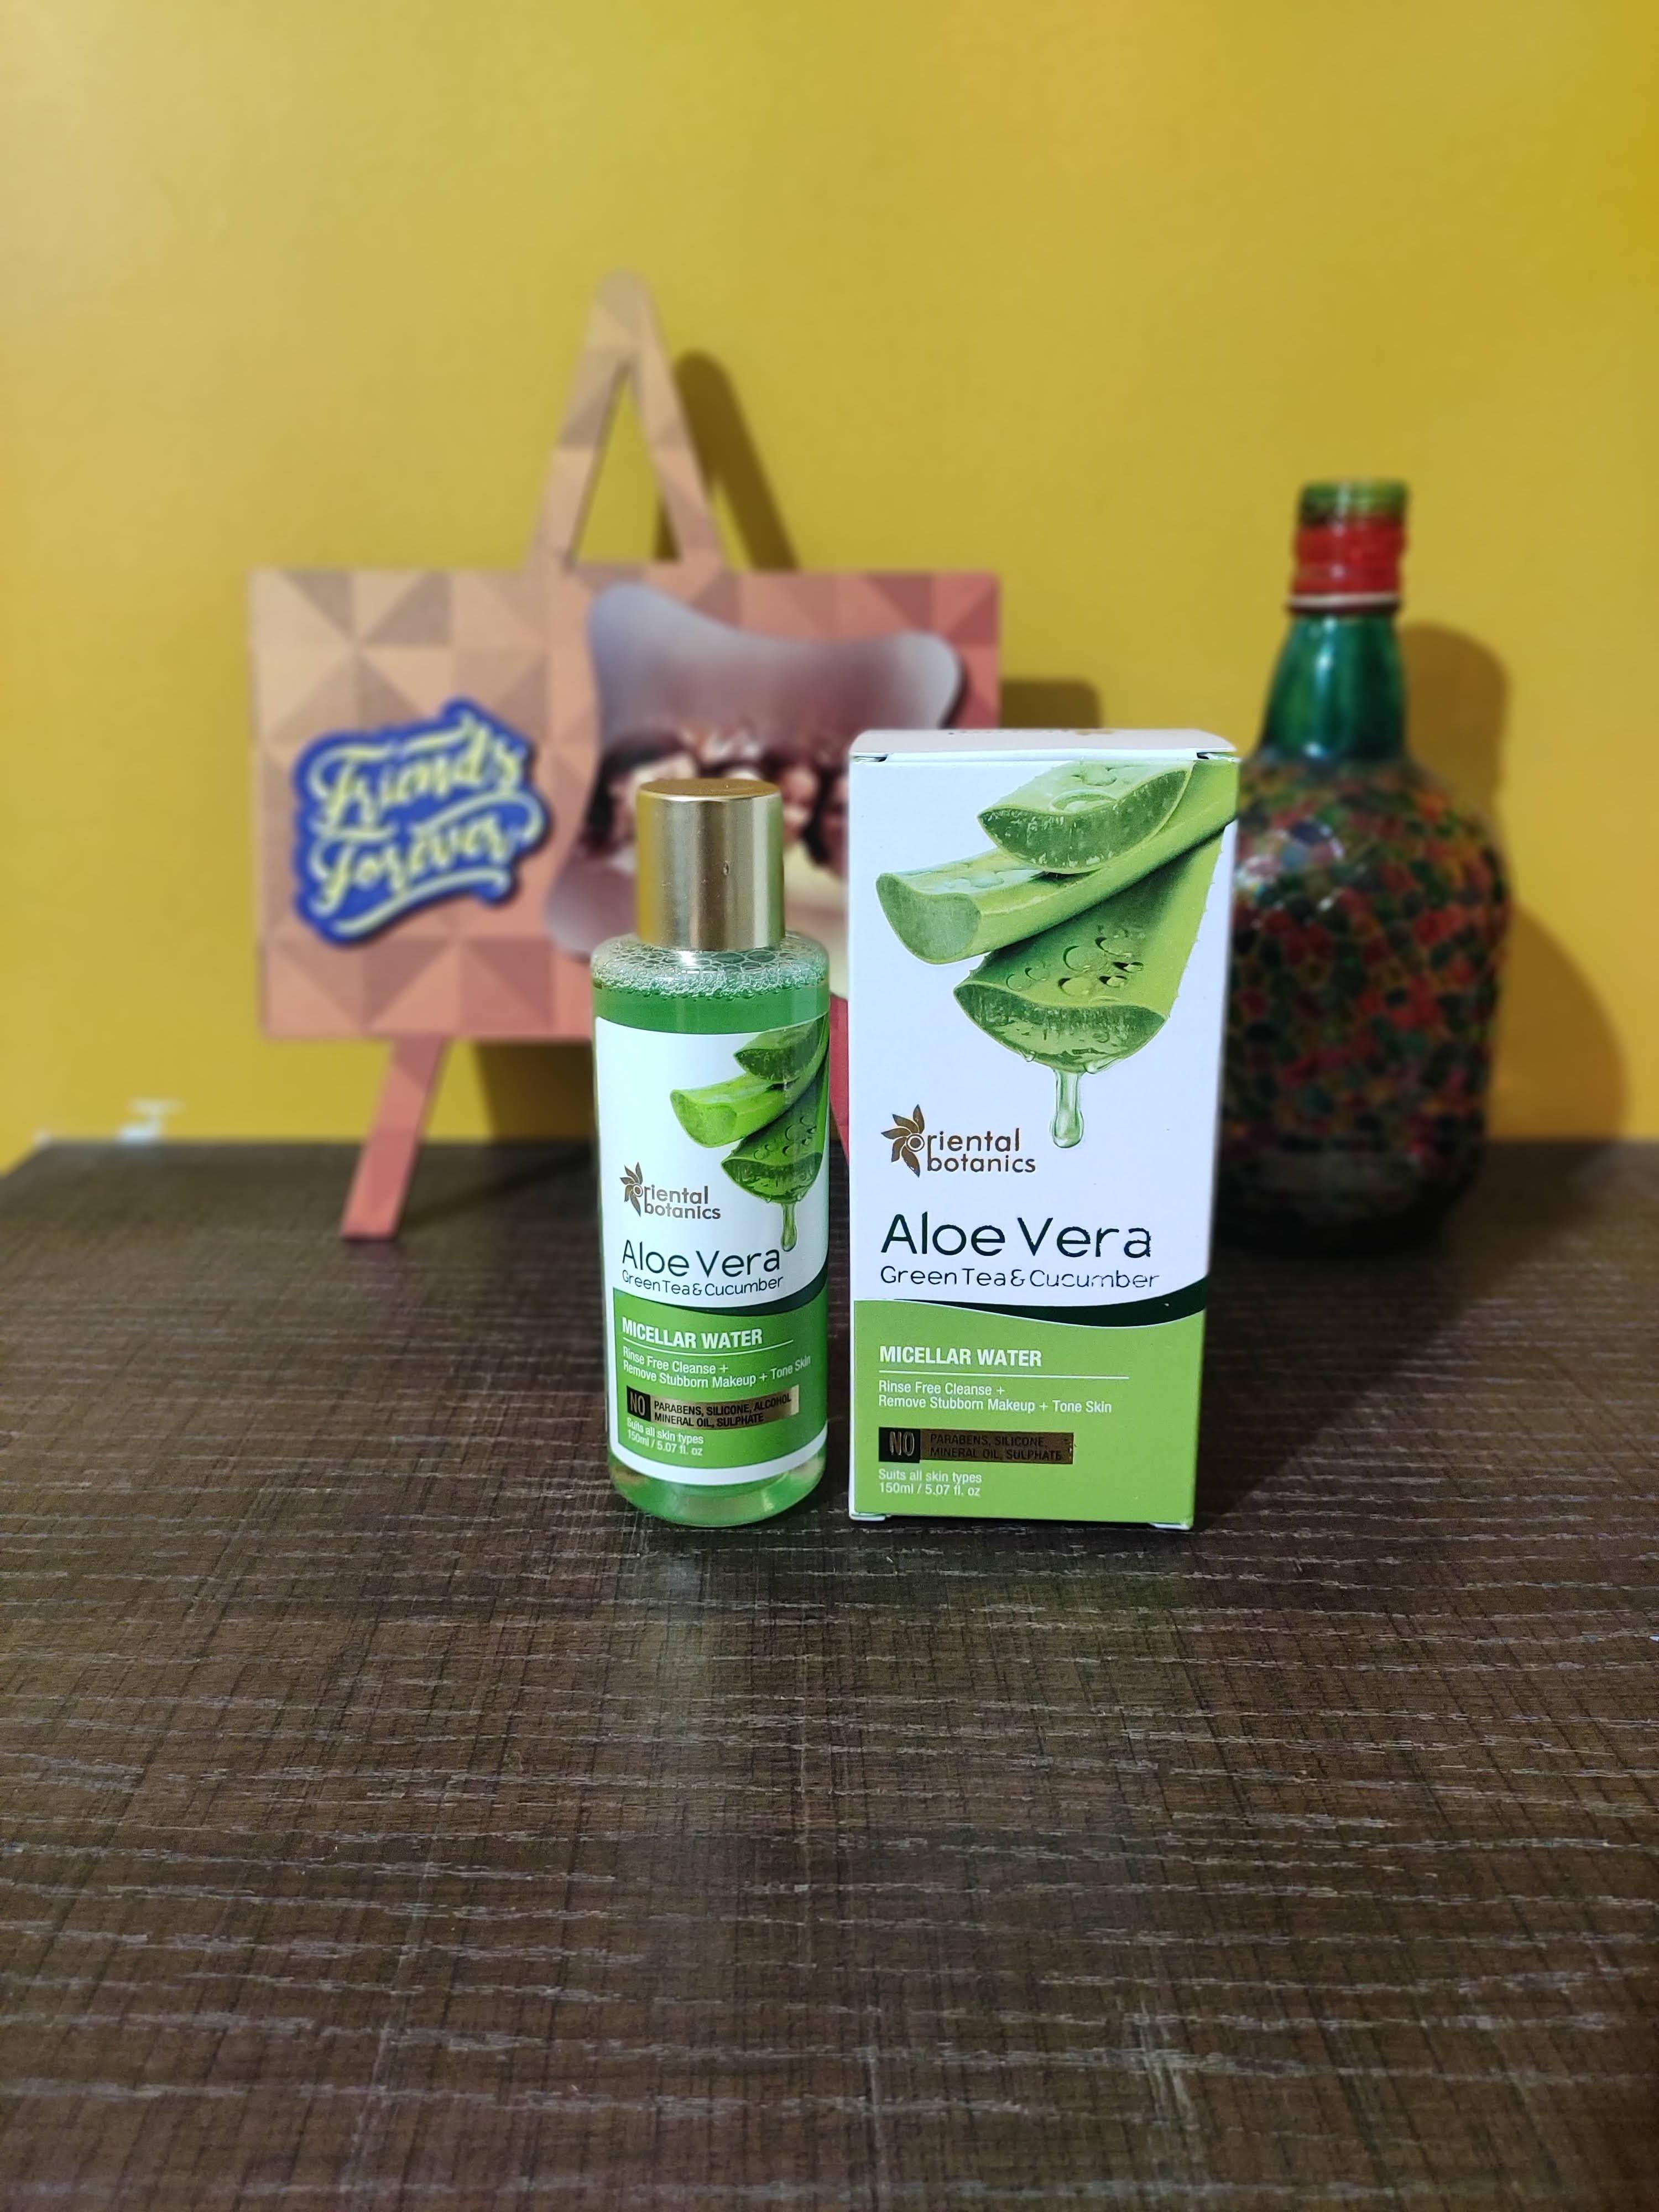 Oriental Botanics Aloe Vera, Green Tea & Cucumber Micellar Water -The best rinse-free natural makeup remover-By jaya_sathaye